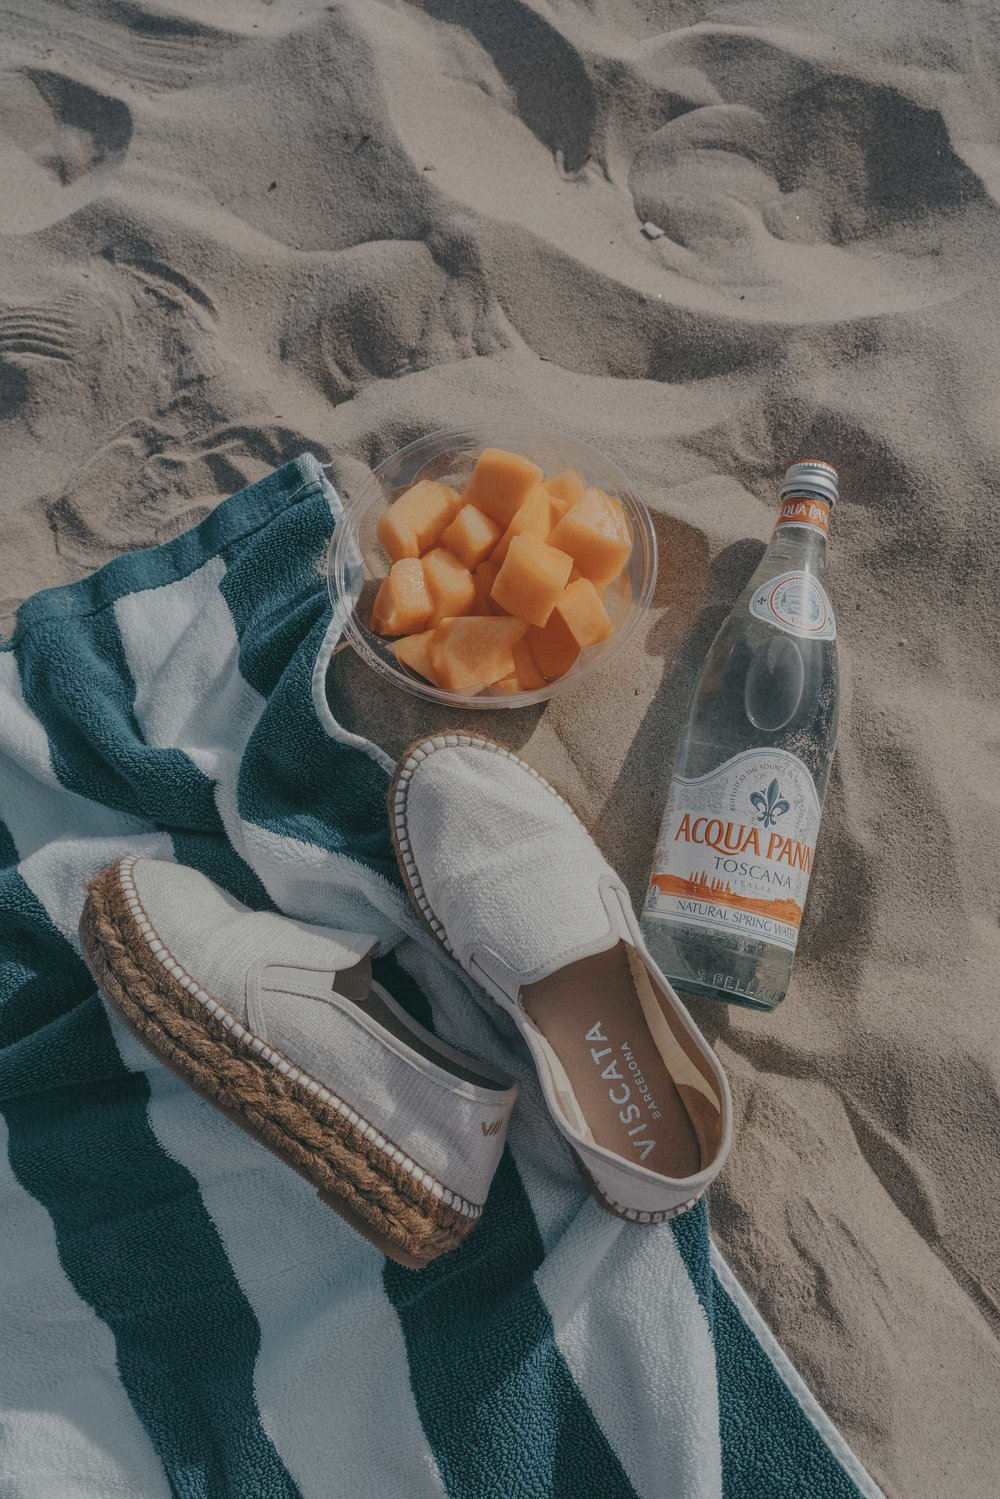 Tavik-Kenton-Asymmetrical-one-shoulder-one-piece-Newport-Beach-california-summer-1.jpg